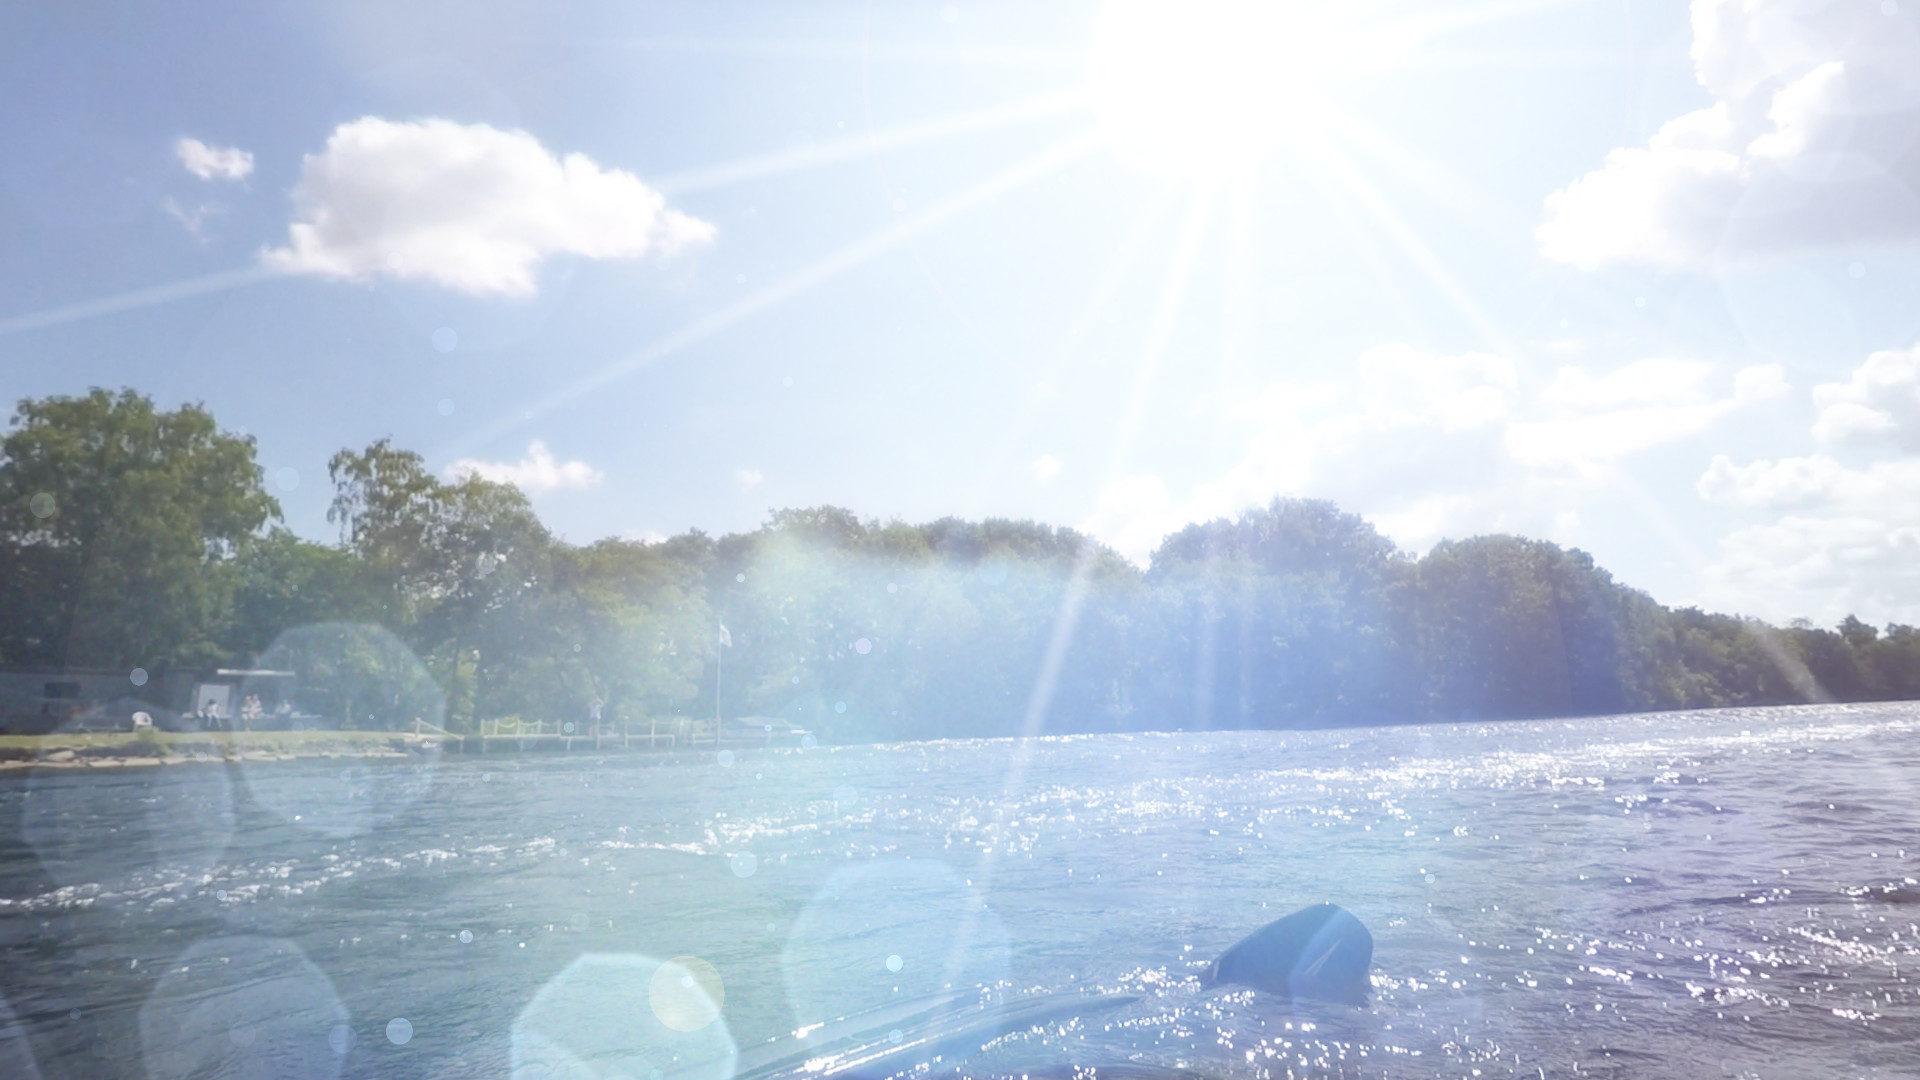 GoPro lens footage - adding flares